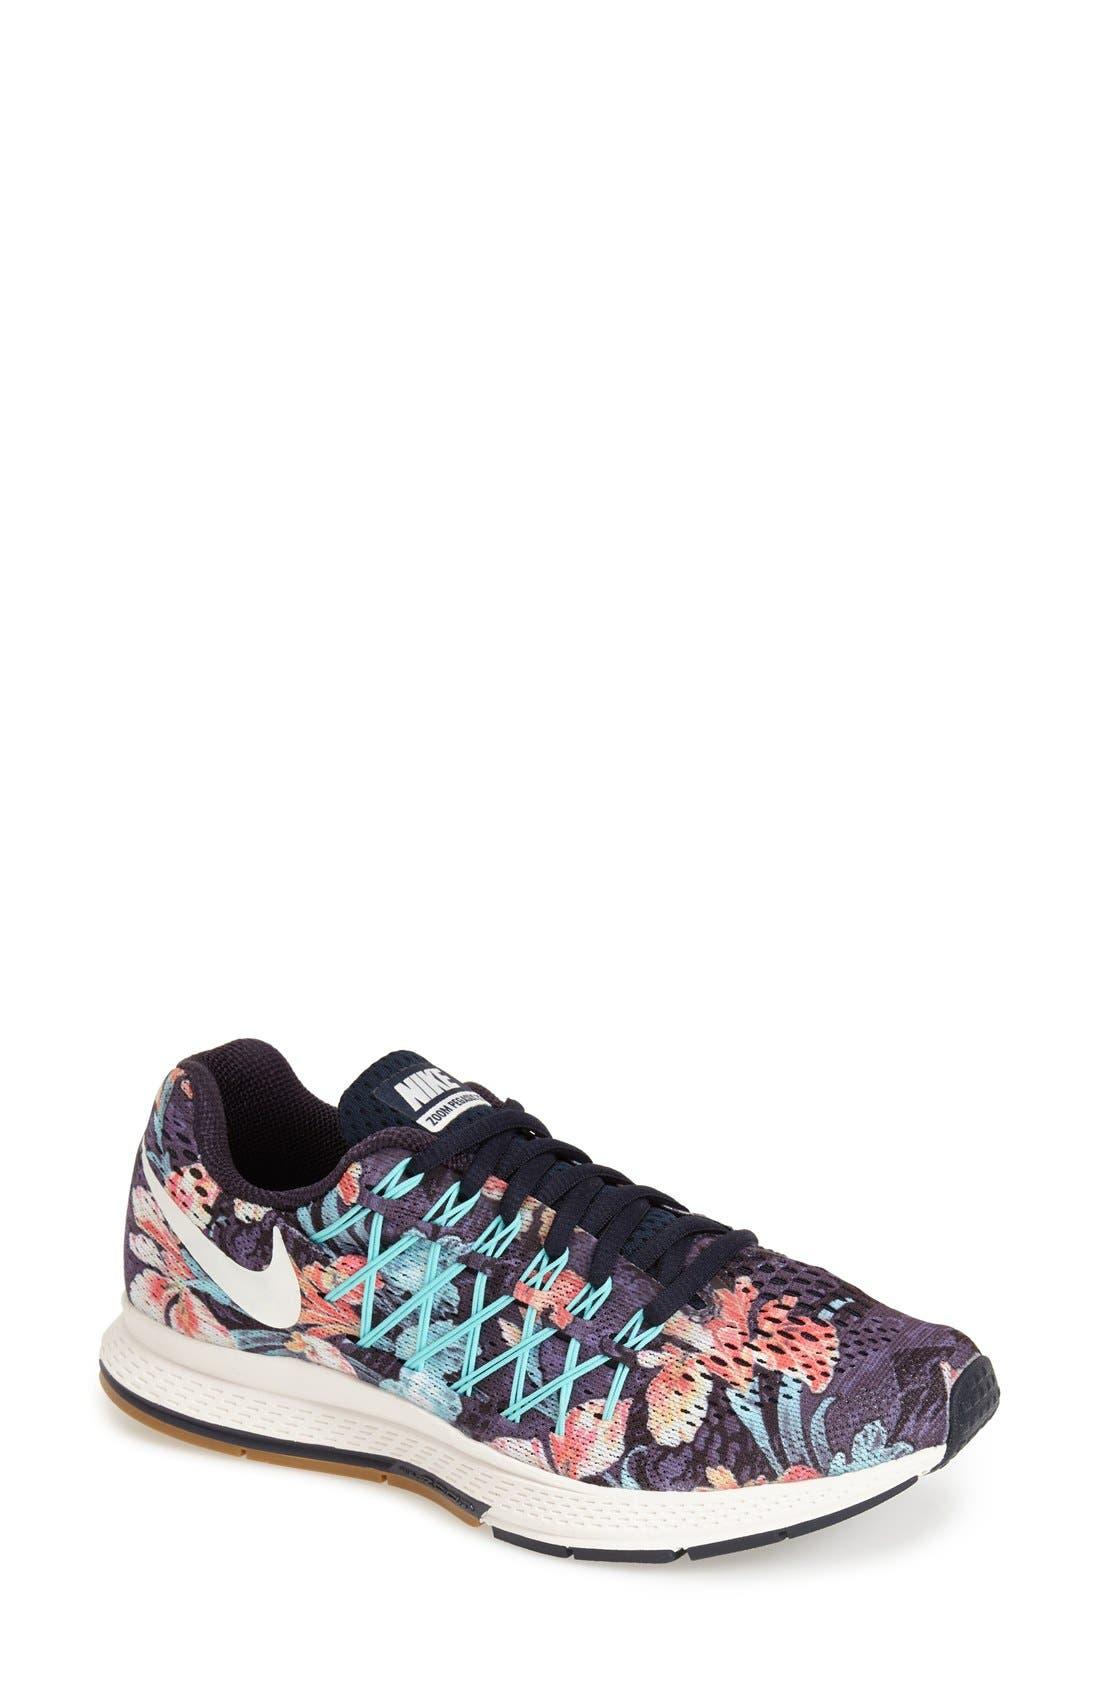 Alternate Image 1 Selected - Nike 'Air Pegasus 32' Running Shoe (Women)